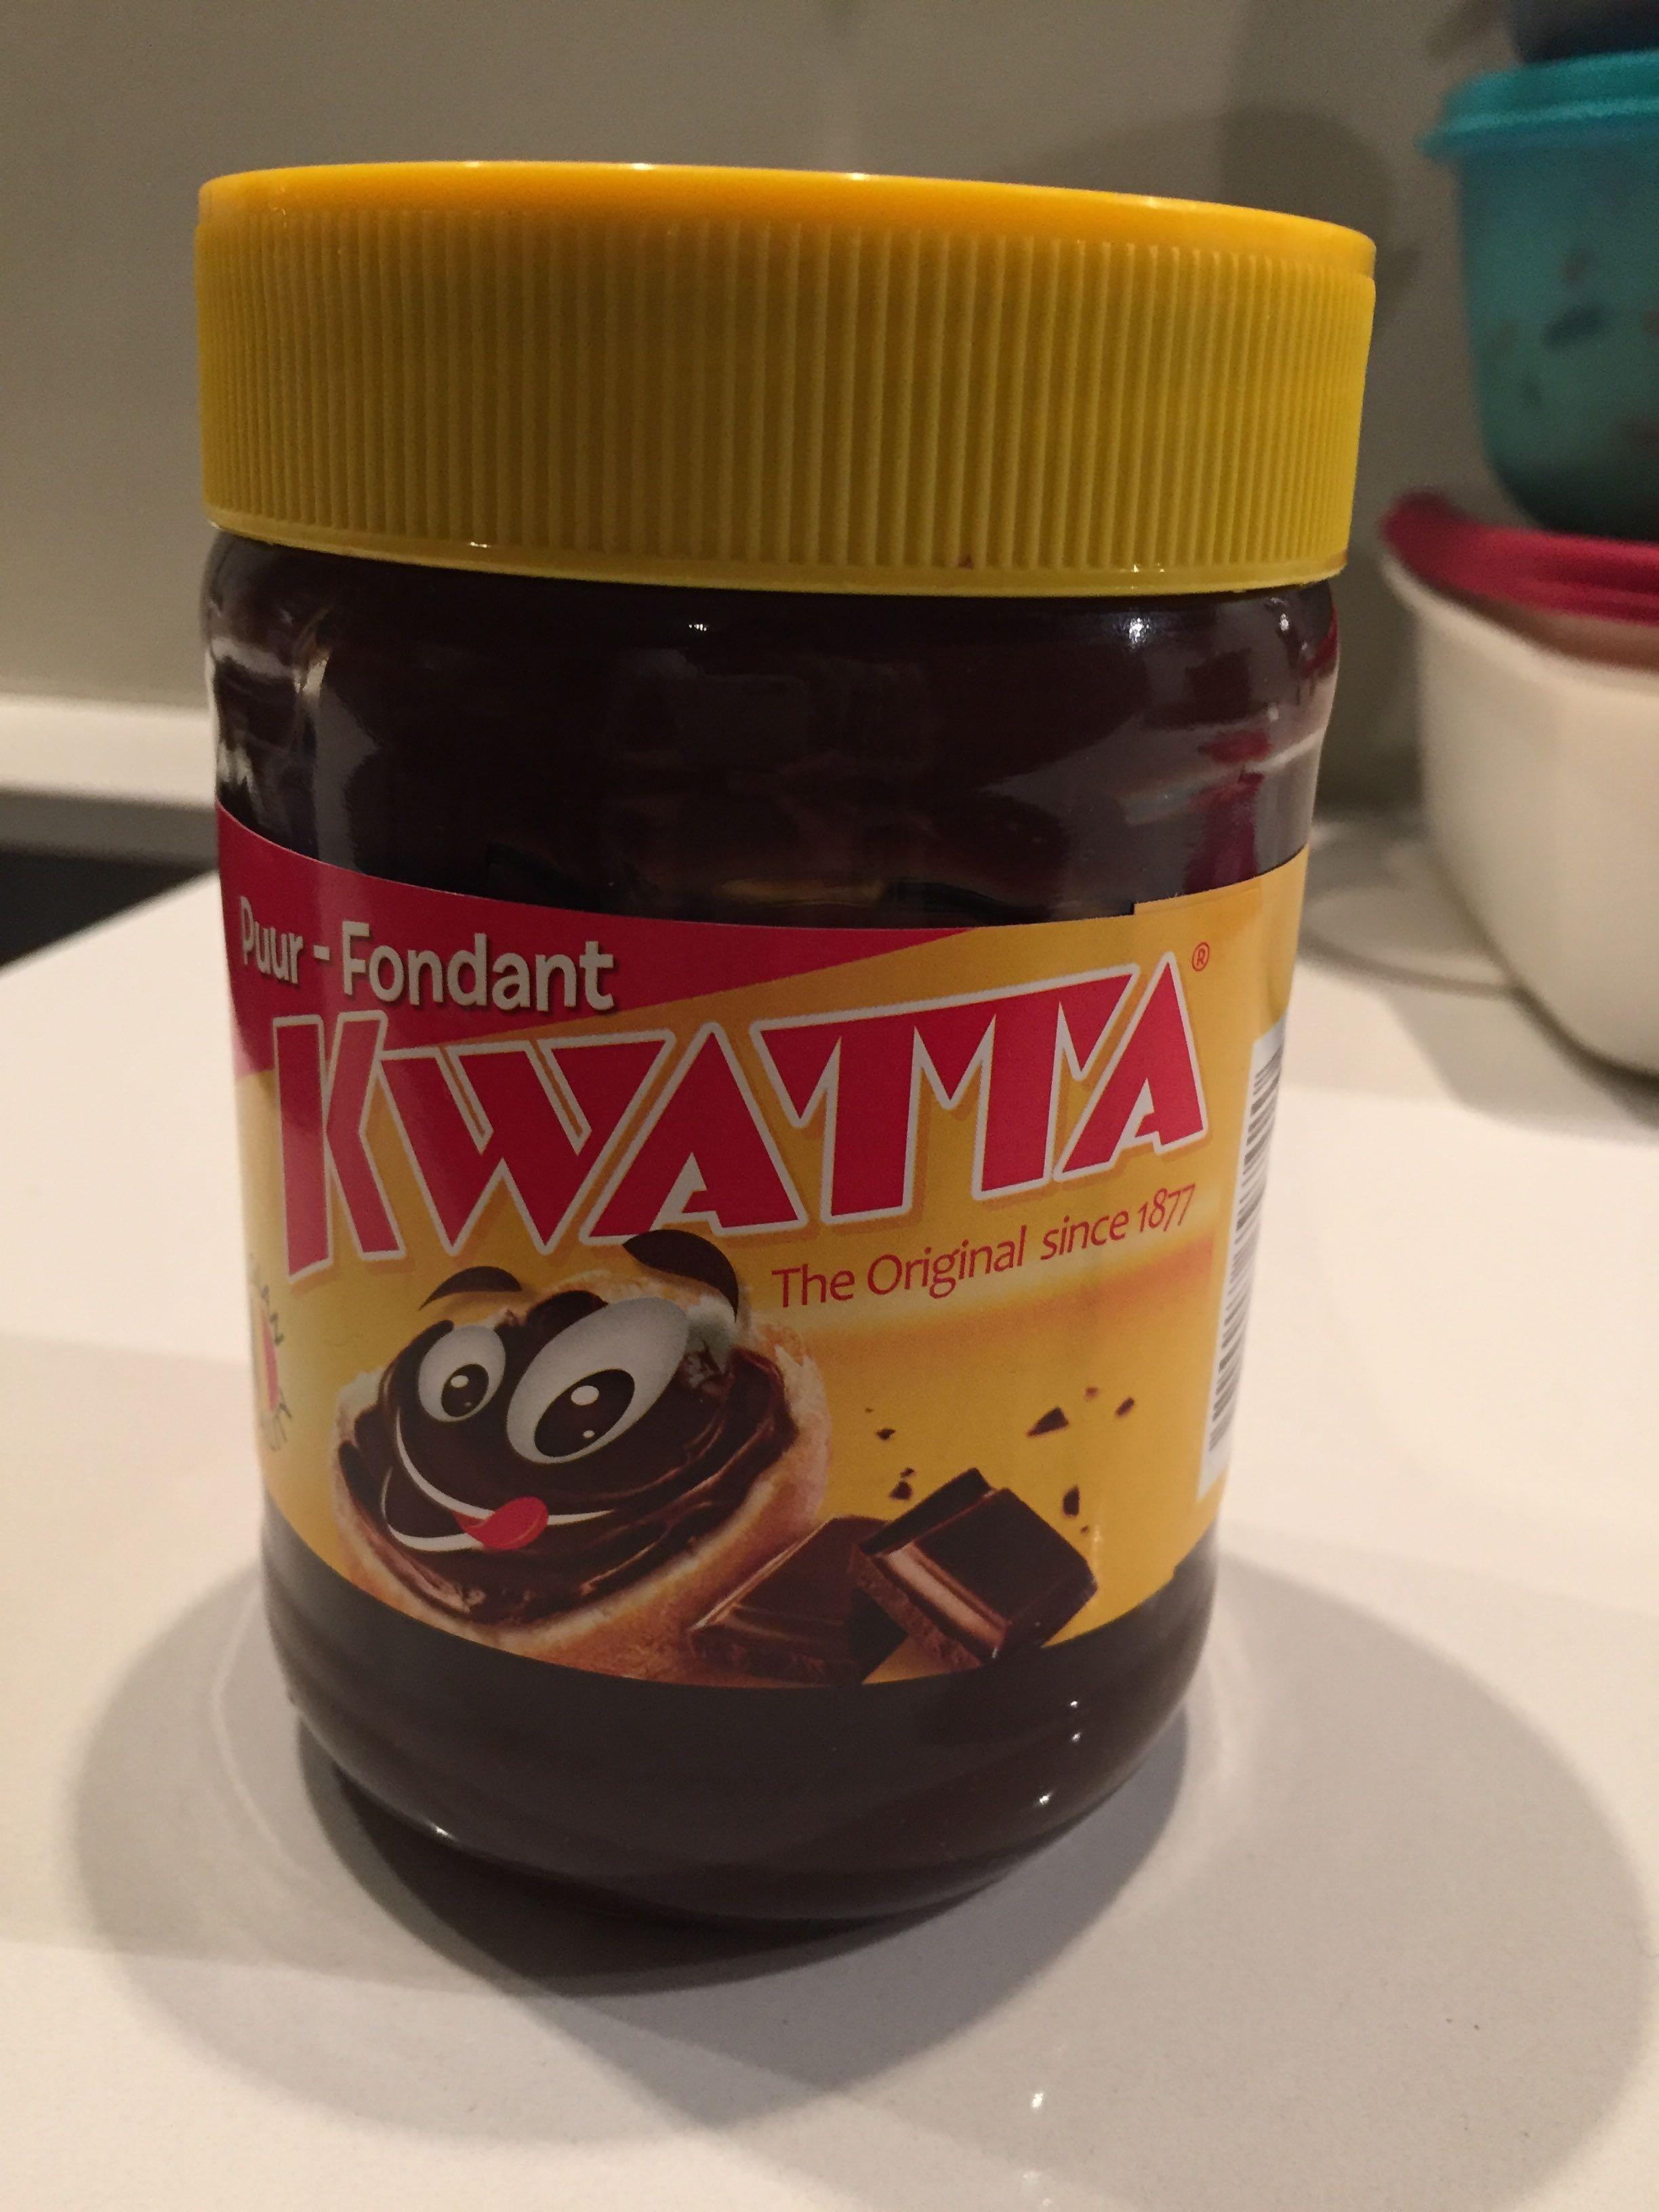 Kwatta fondant - Product - fr